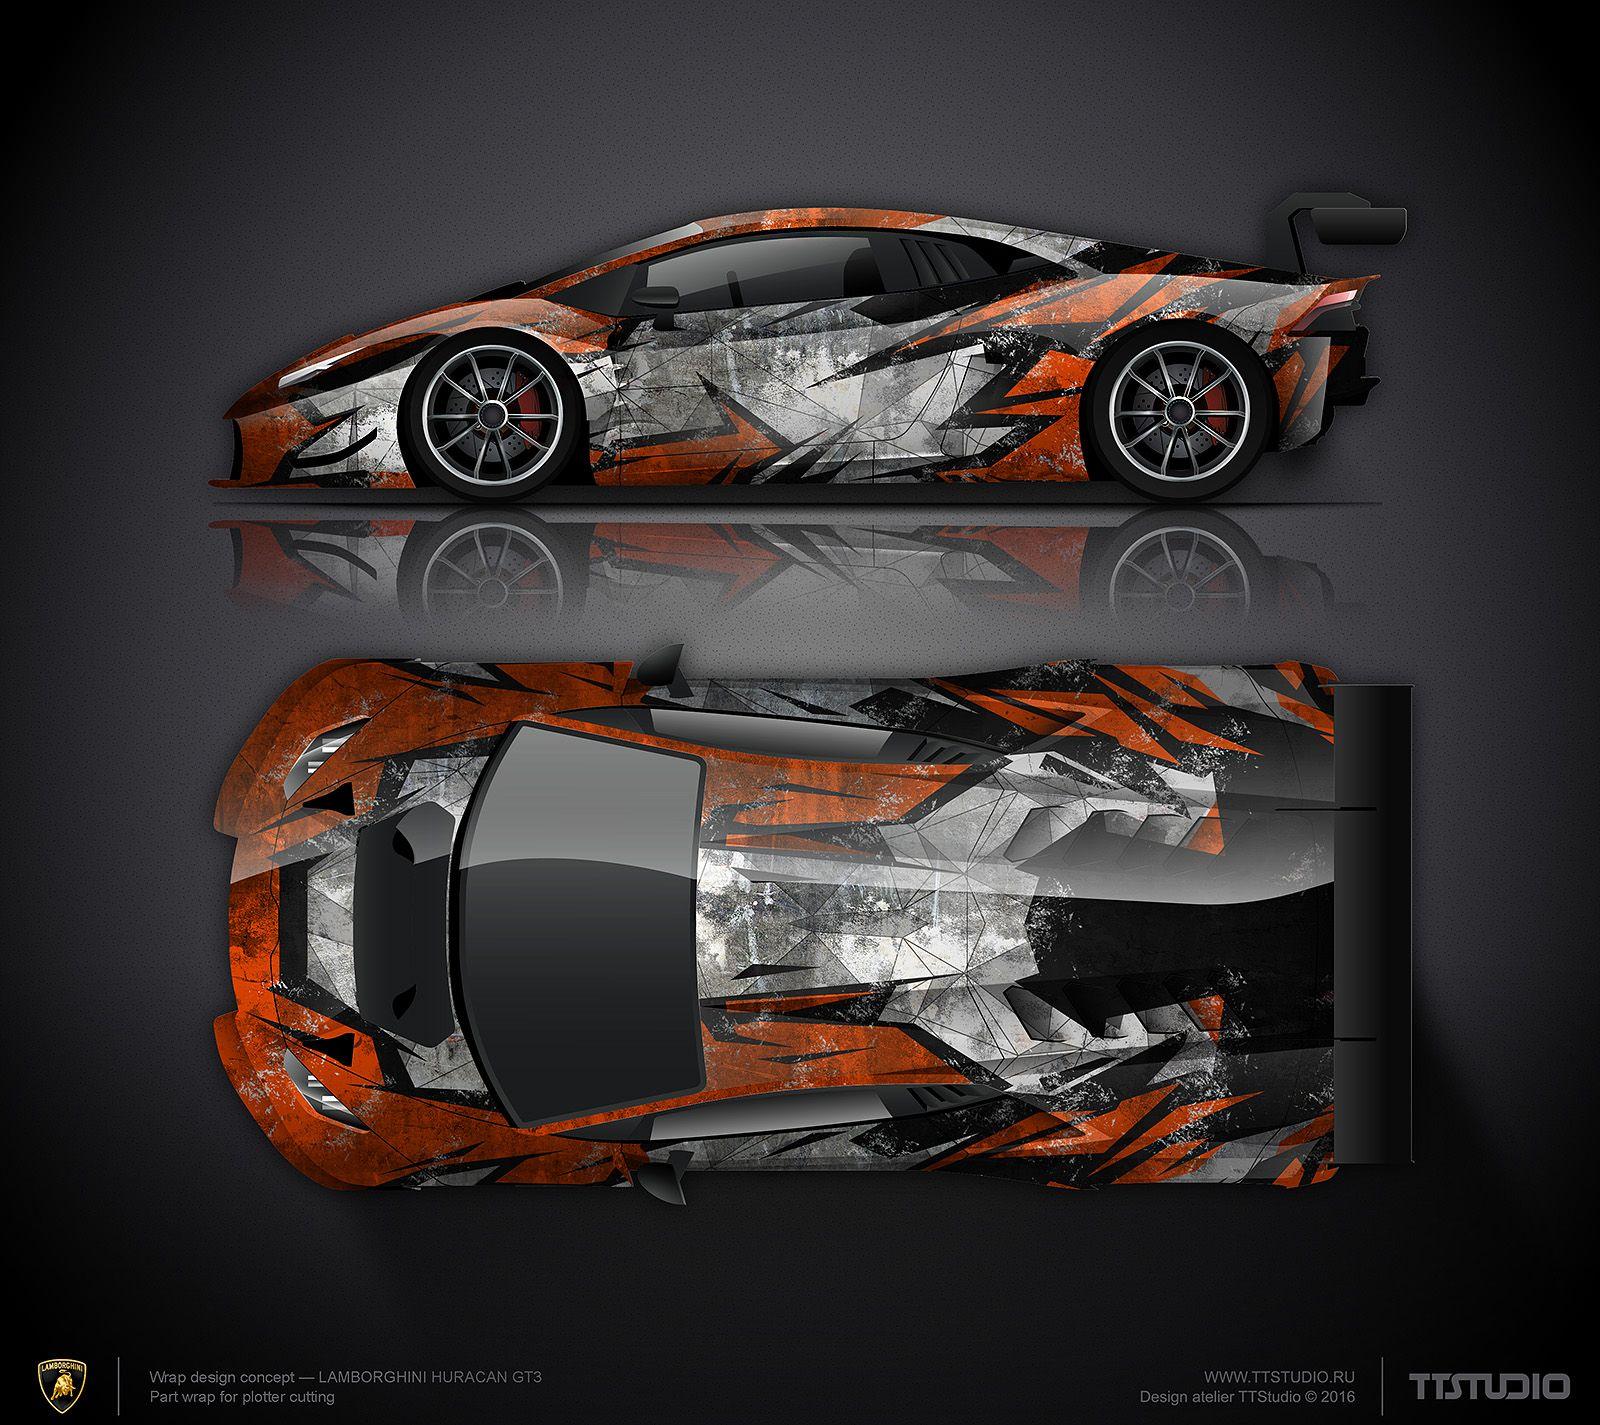 Car decals tribal graphic design zion series - Wrap Design Concept 8 Scratch Livery Lamborghini Huracan Gt3